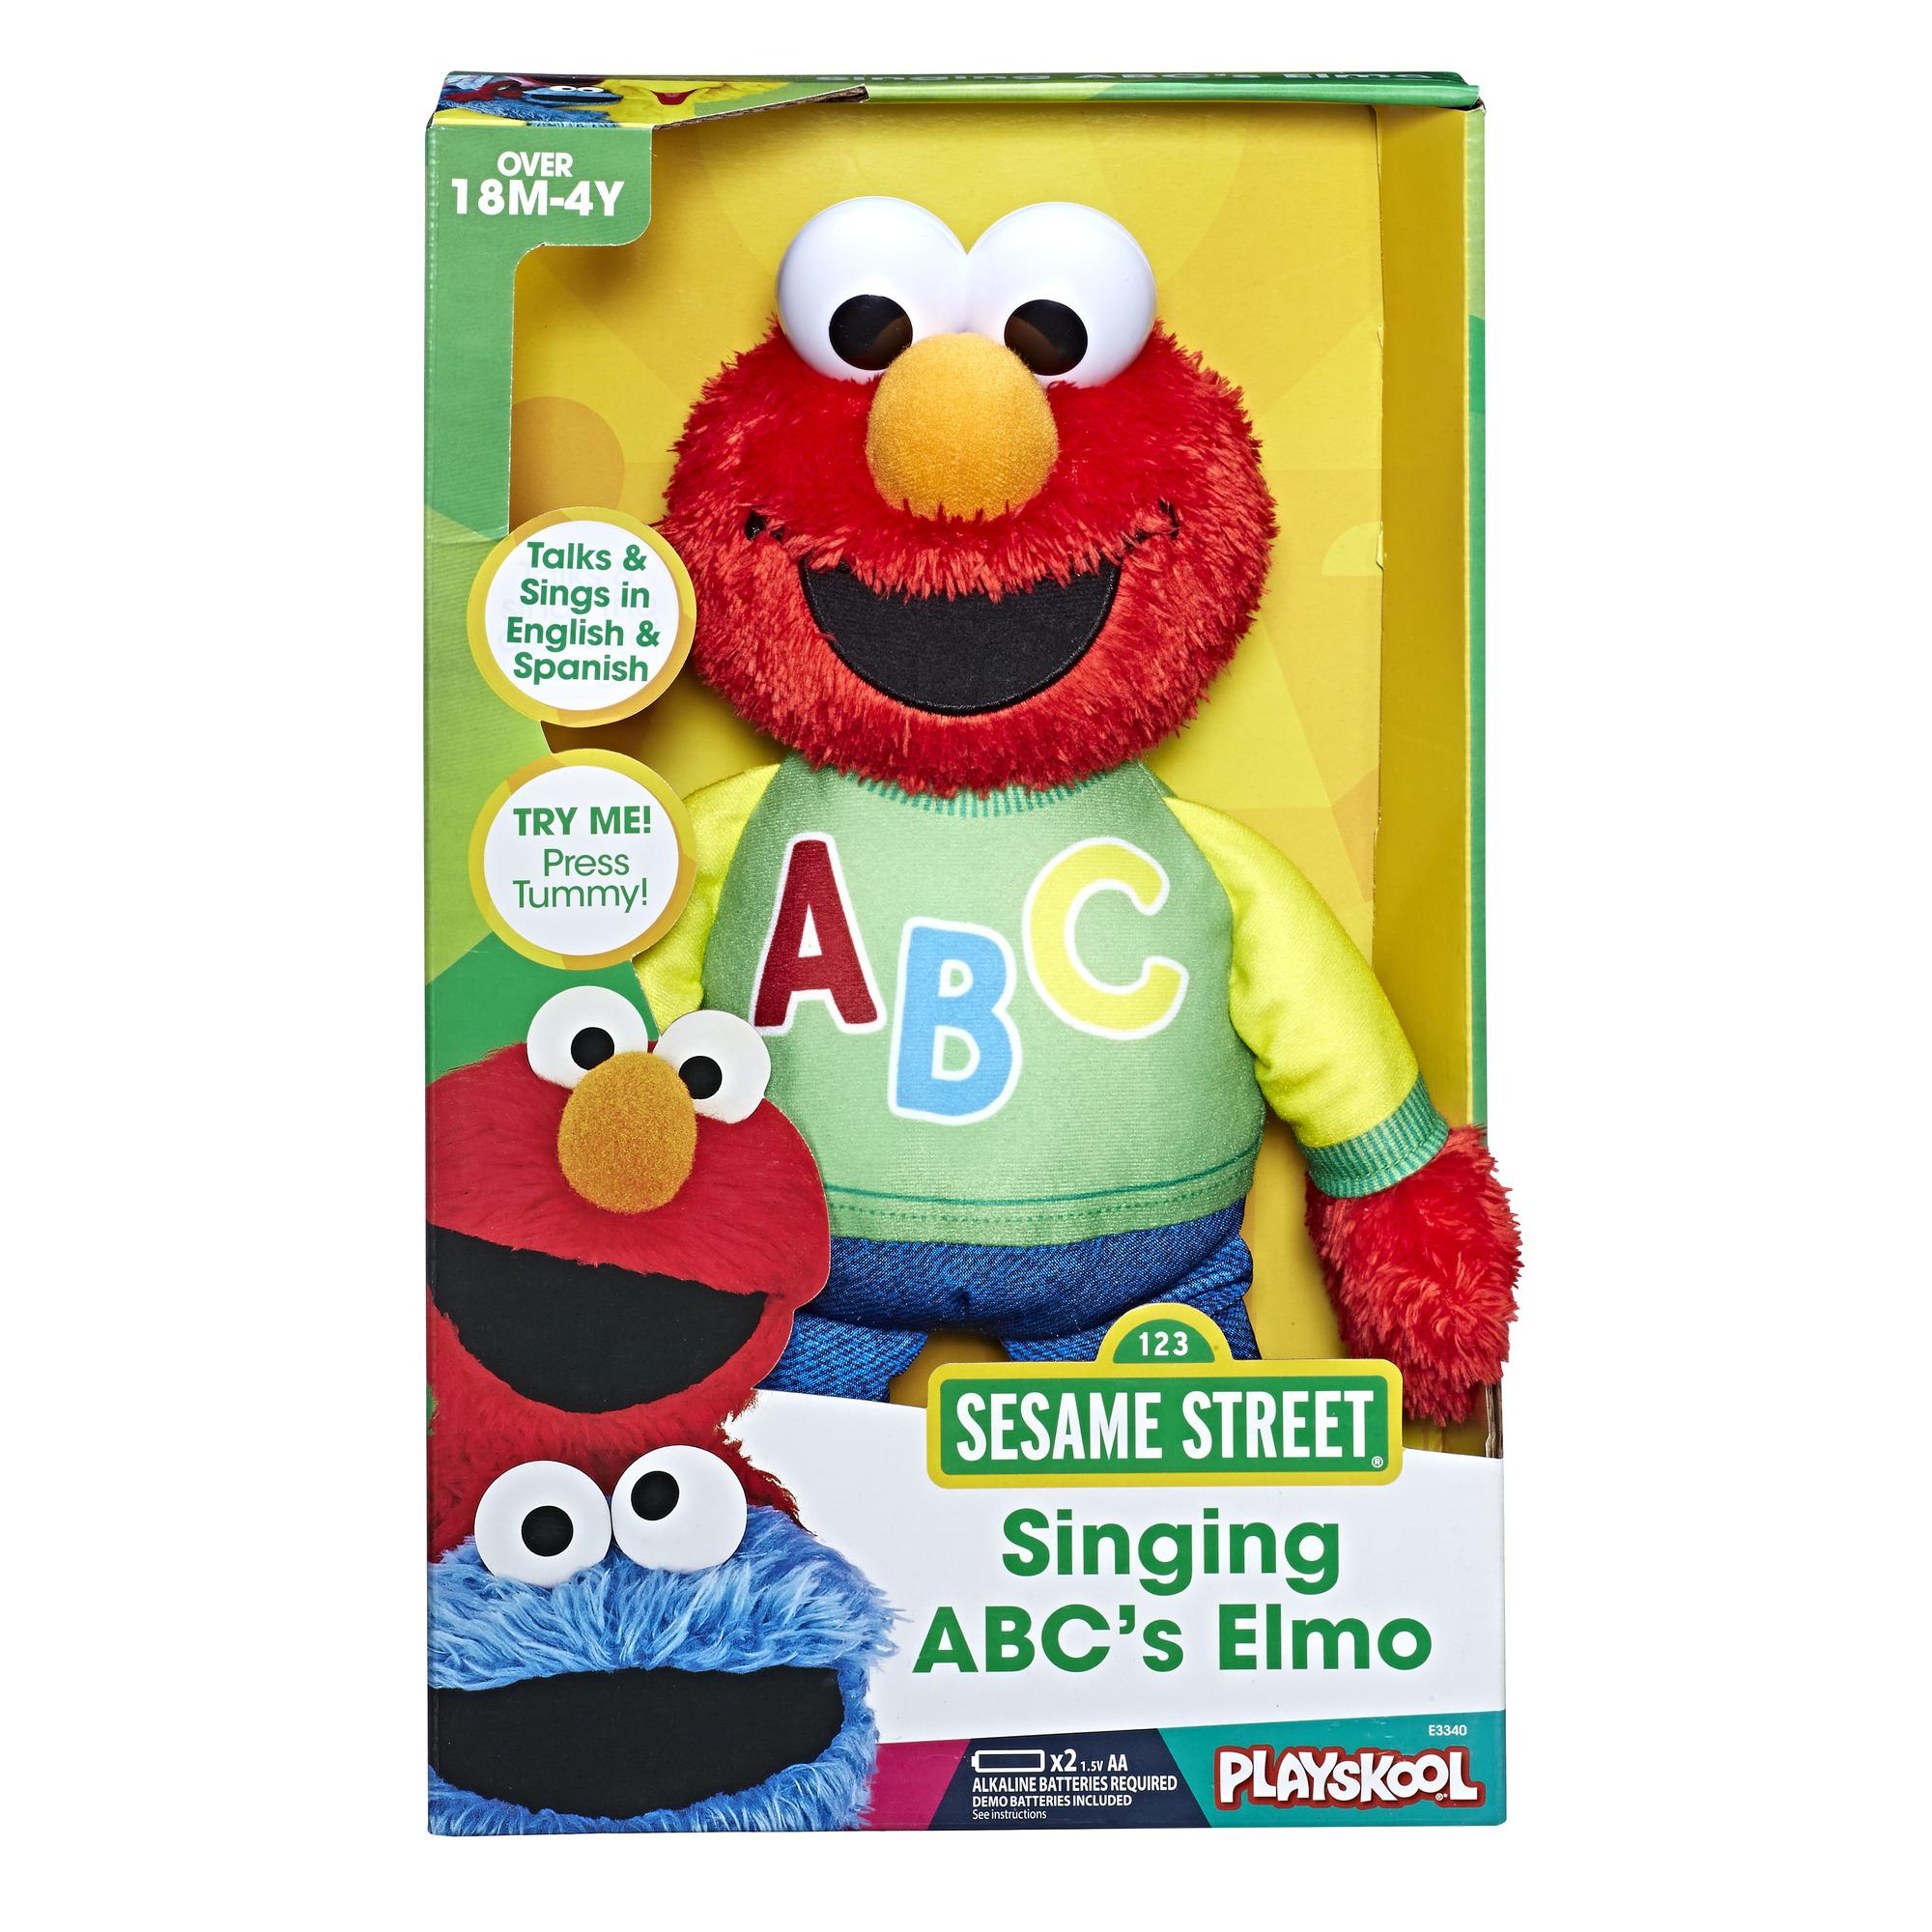 Playskool Sesame Street Singing ABC's Elmo @ Walmart B&M YMMV $5